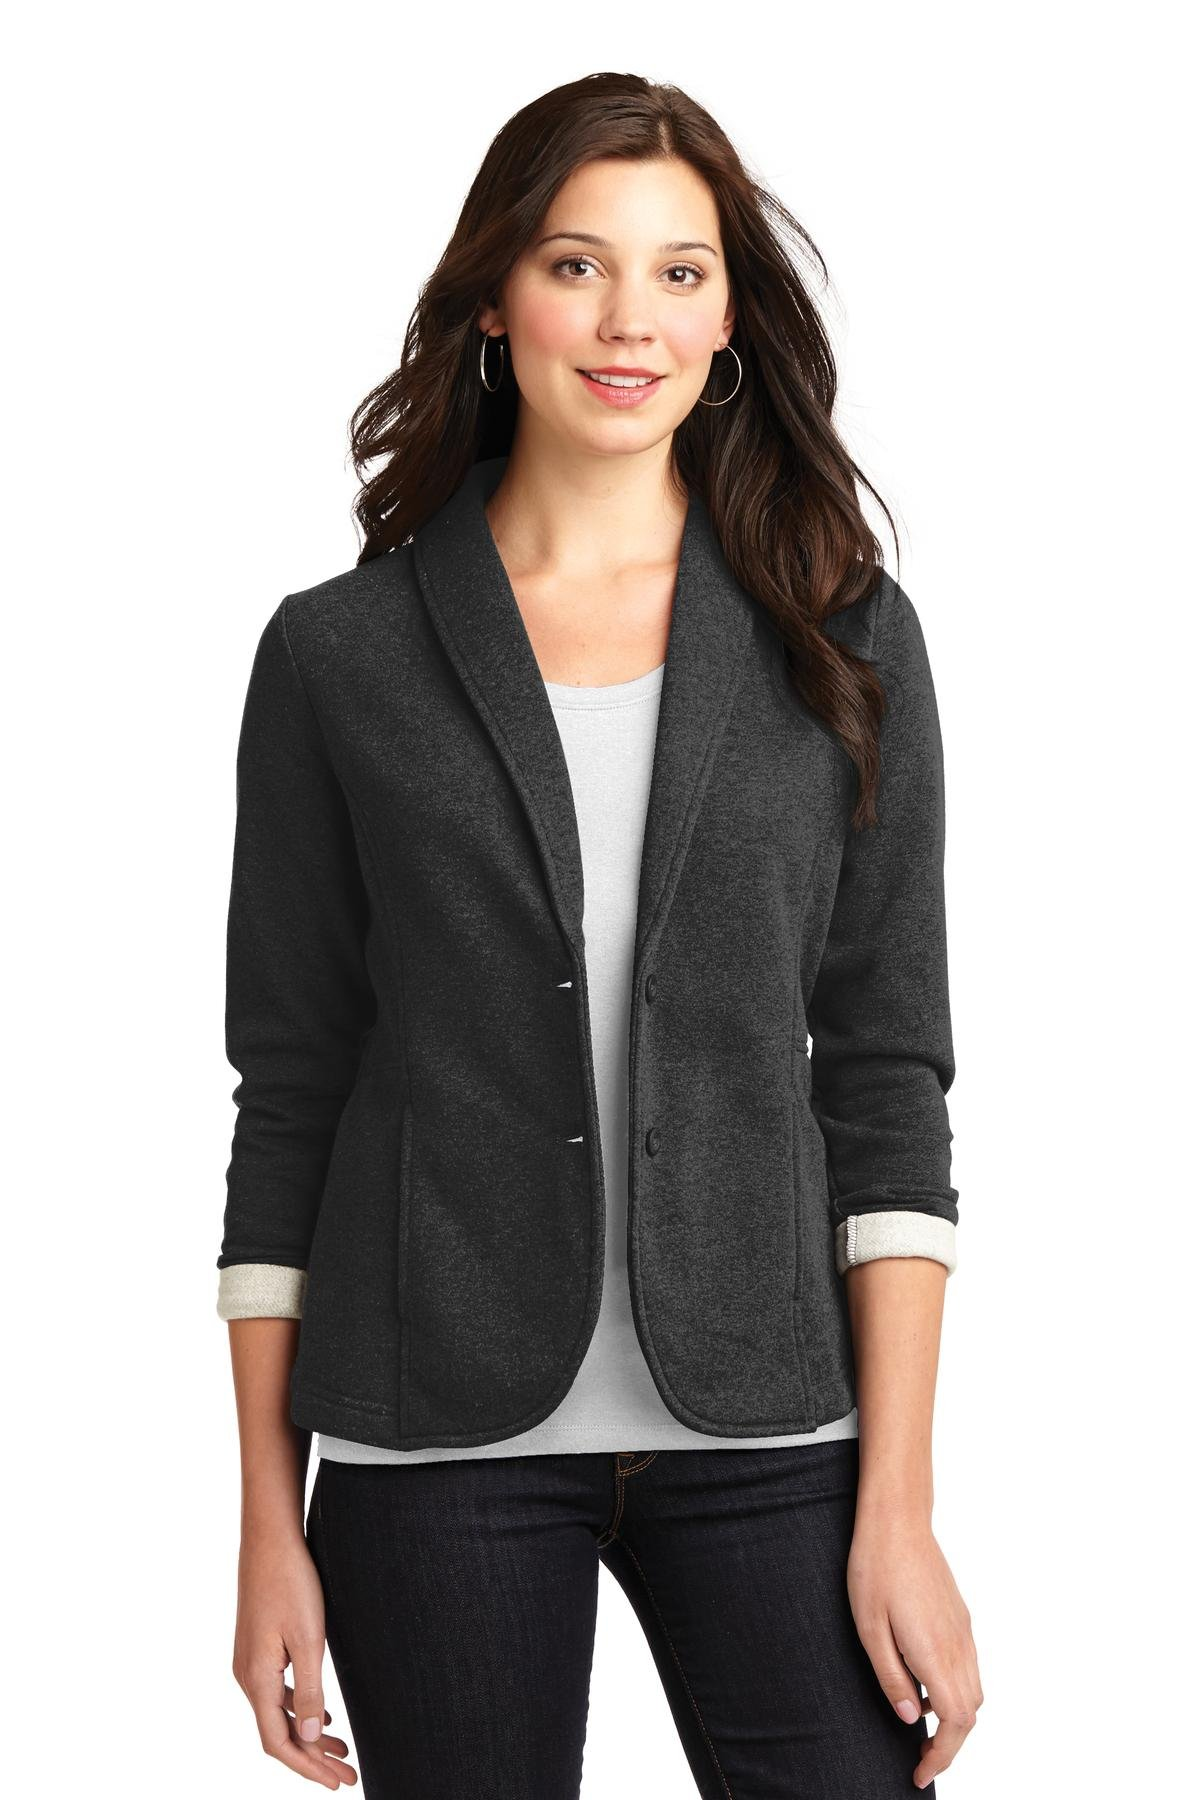 Port Authority Women's Fleece Blazer XL Dark Charcoal Heather